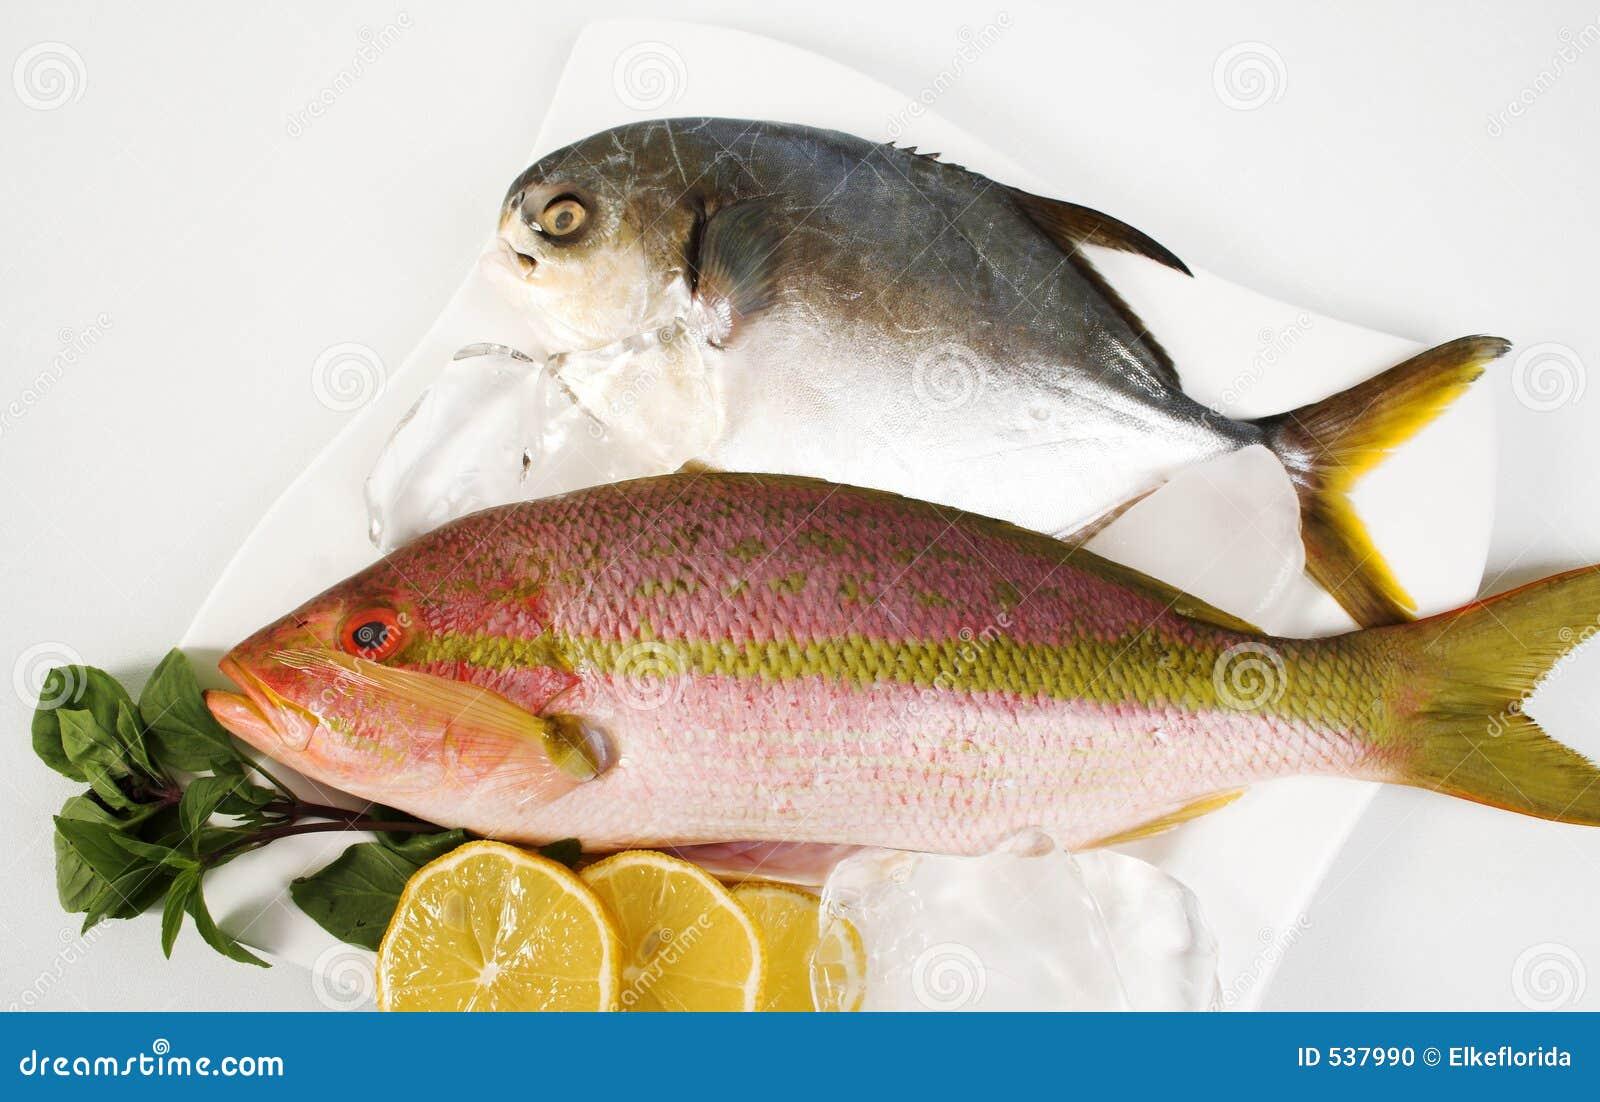 Pesci castagna e snapper